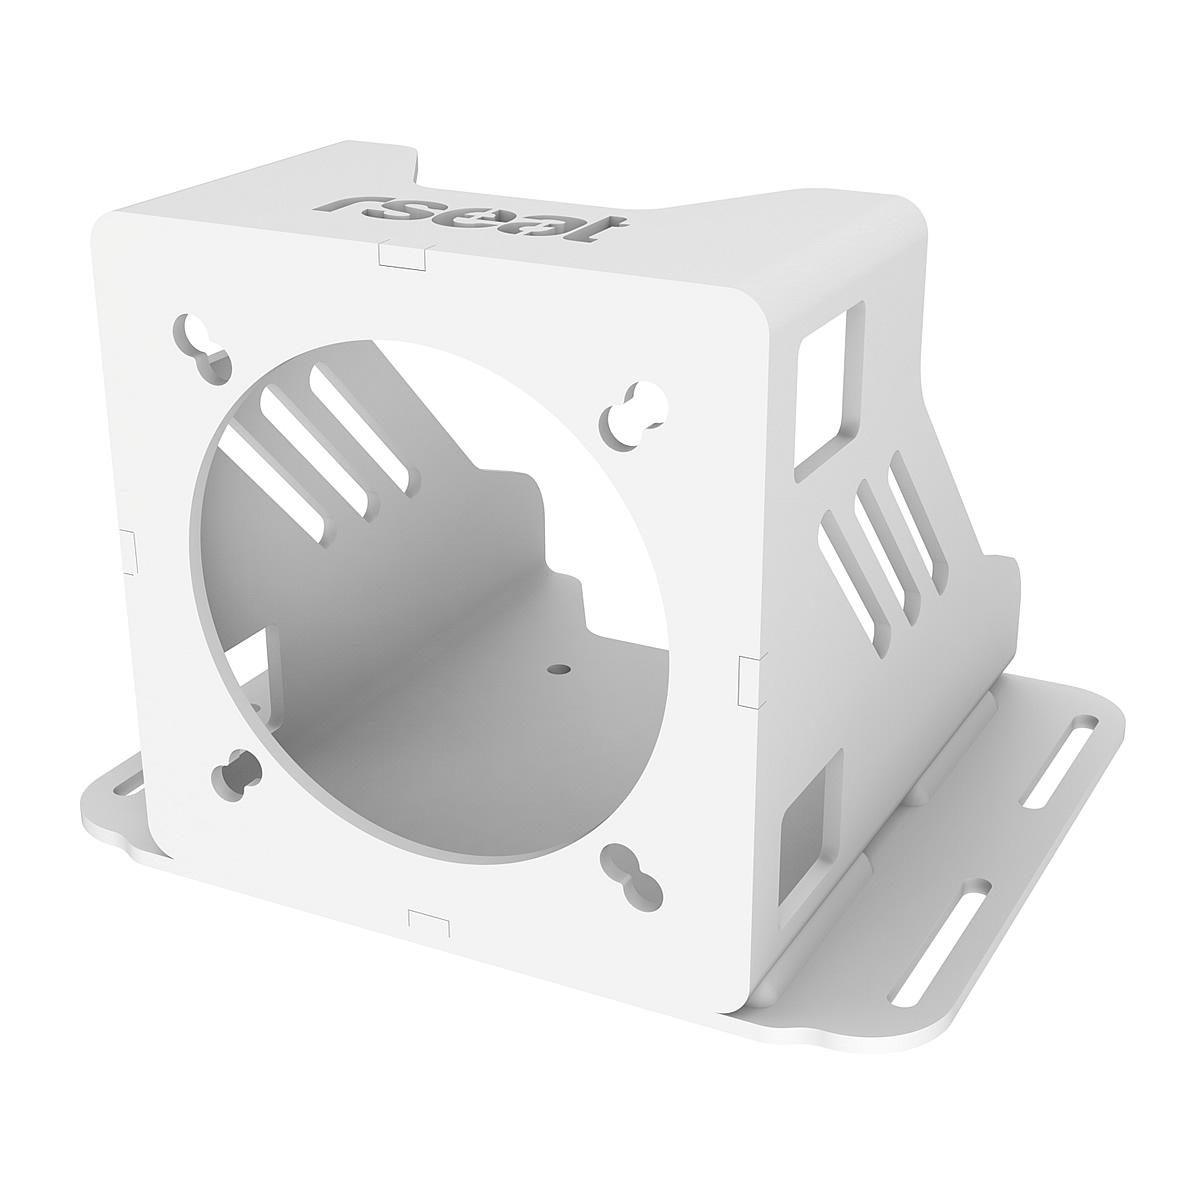 SIMUCUBE 1, 2 Sport/Pro/Ultimate, Mige mount White